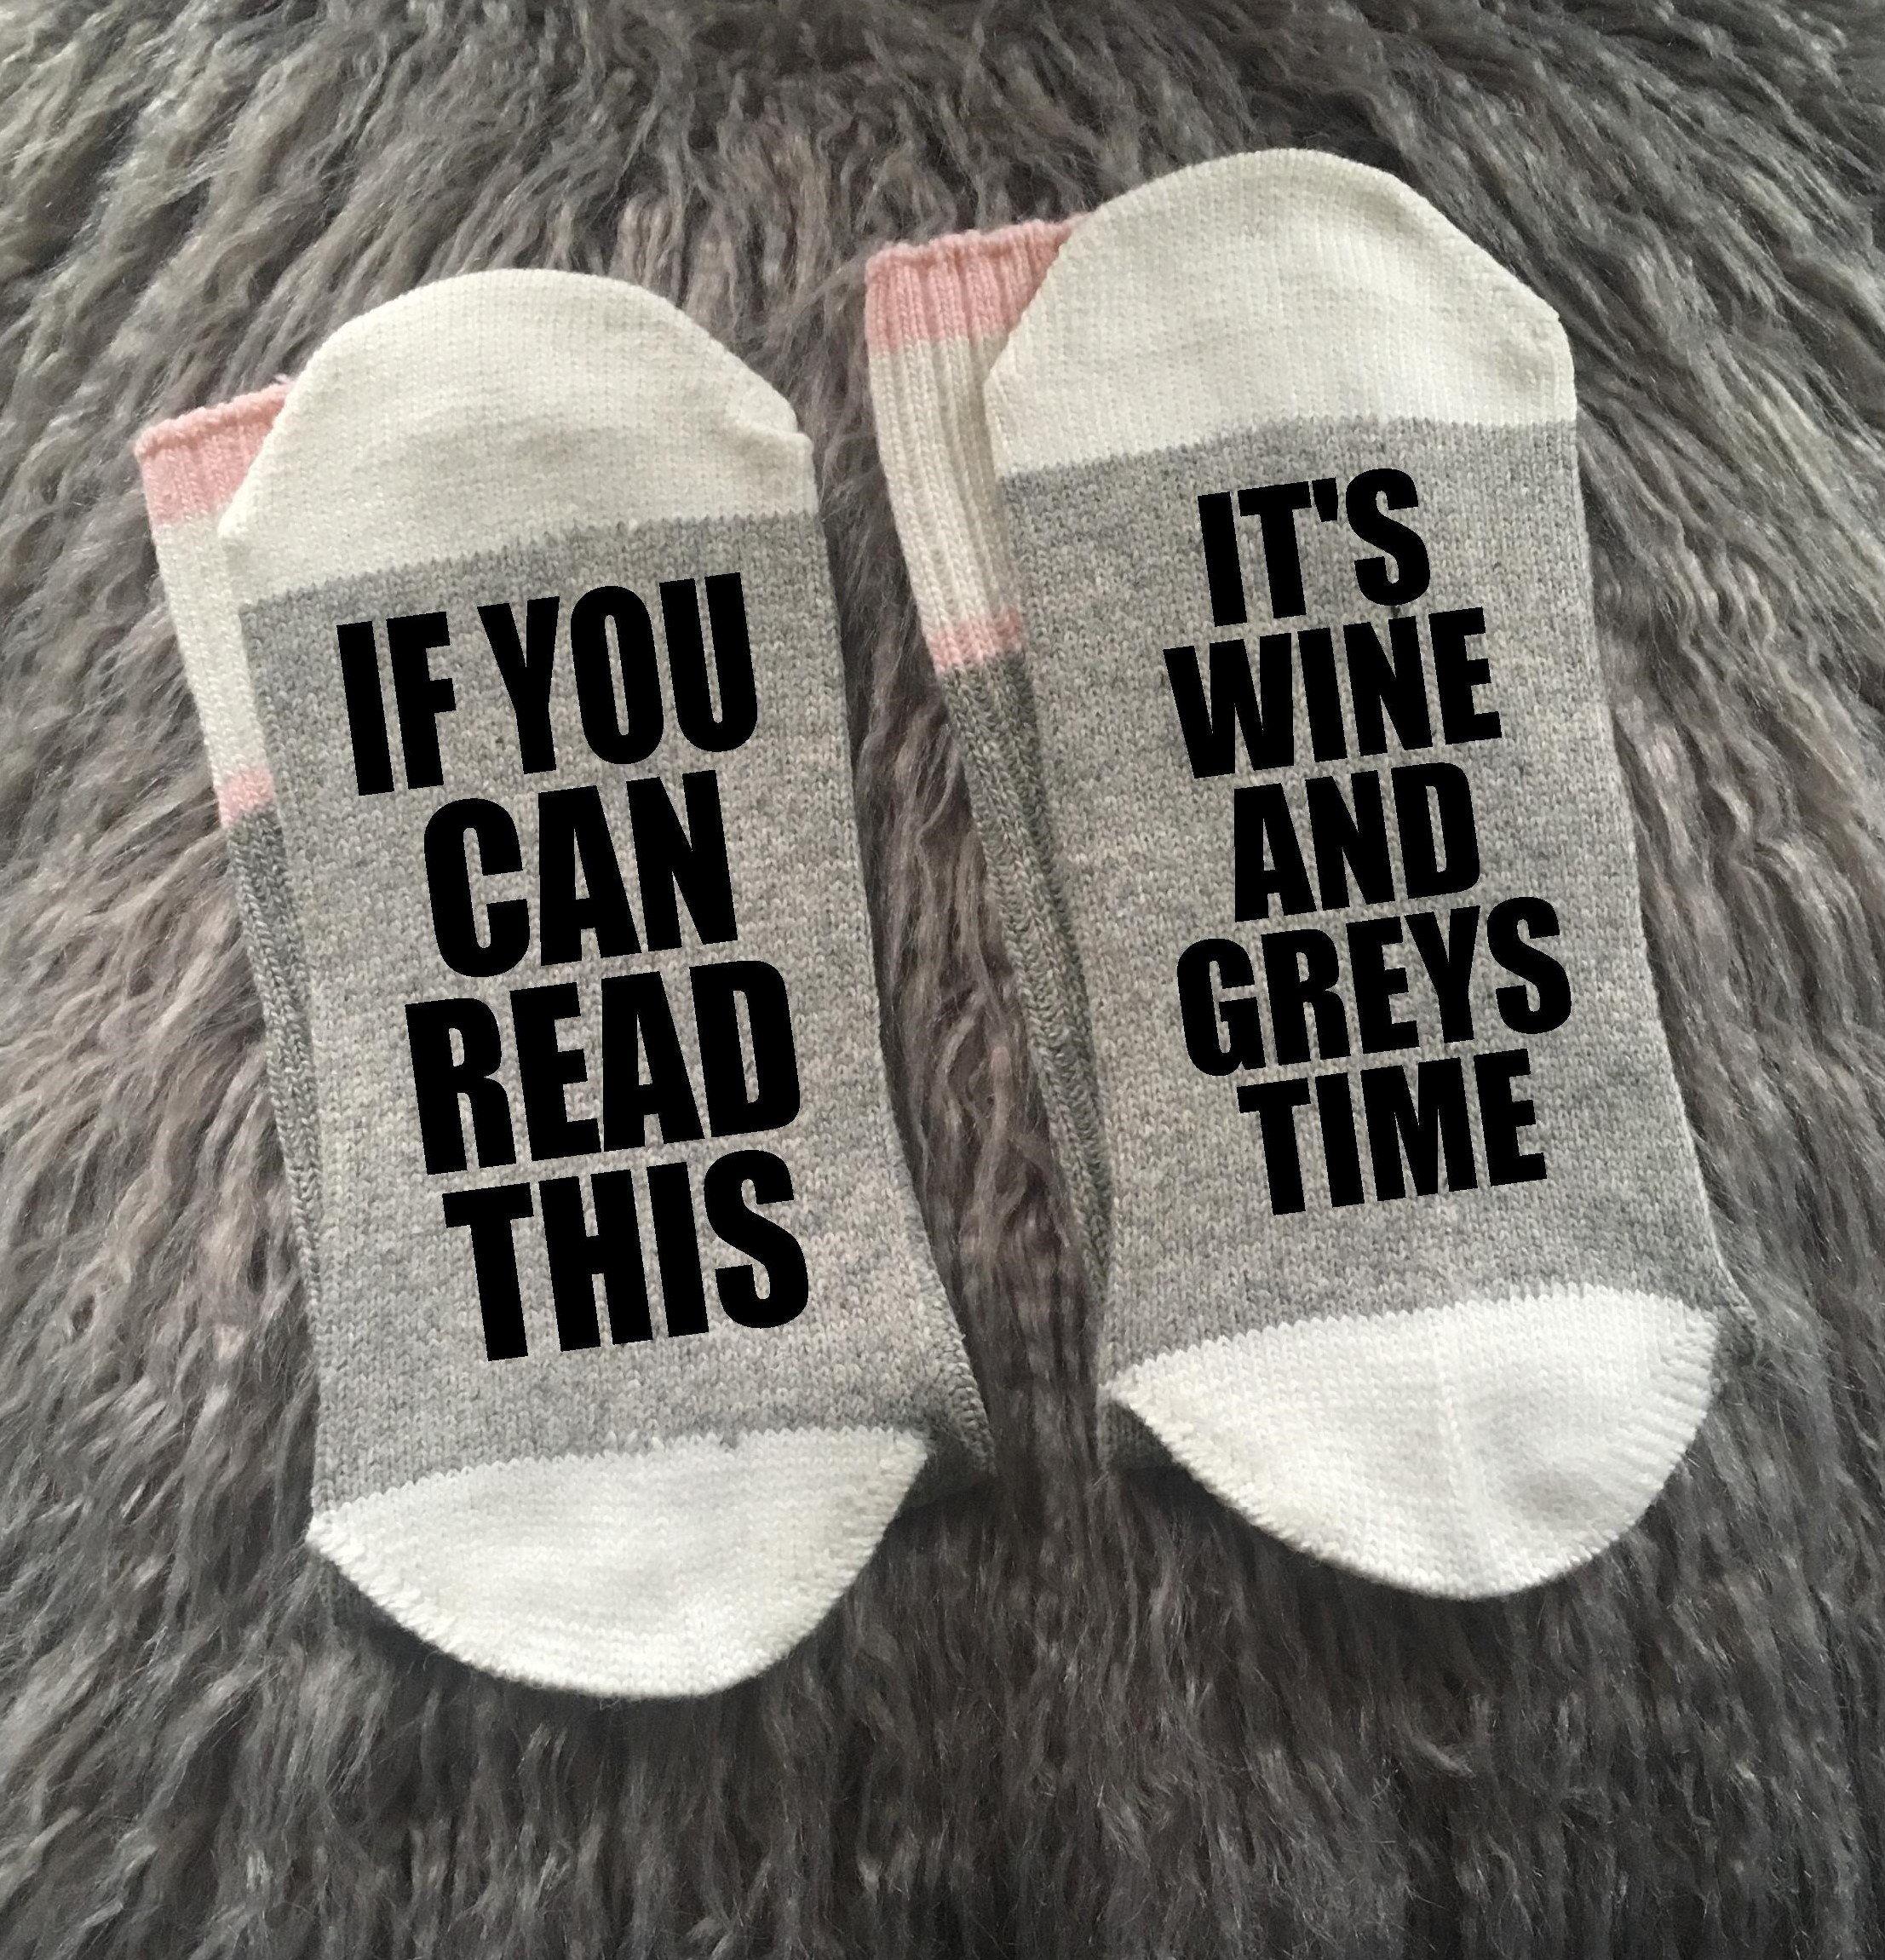 Greys anatomygreys anatomy giftsgreys anatomy socks